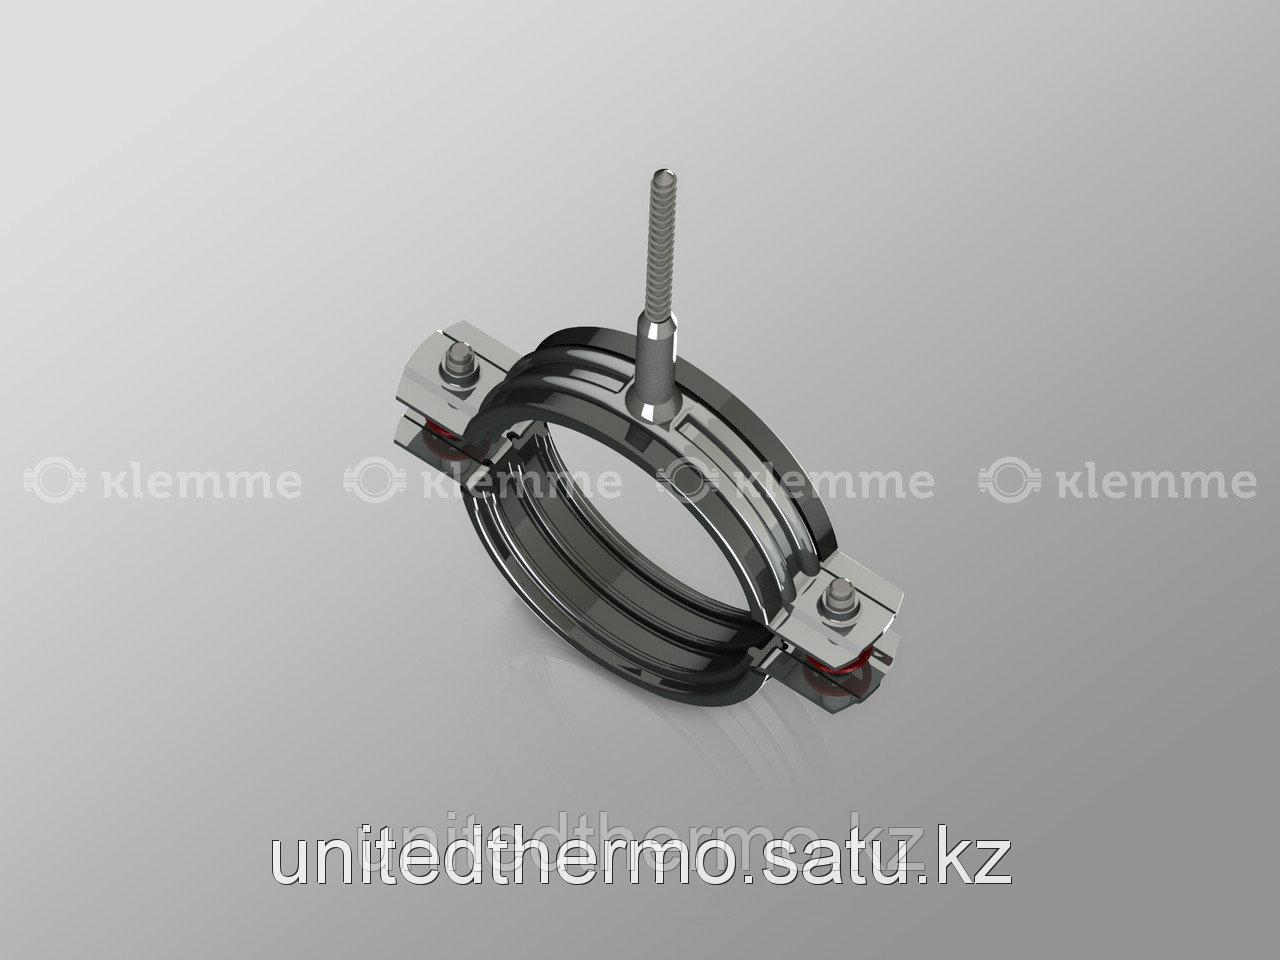 "Хомут 3"" (М10) для труб с резиновым профилем и шурупом 85-92 мм"